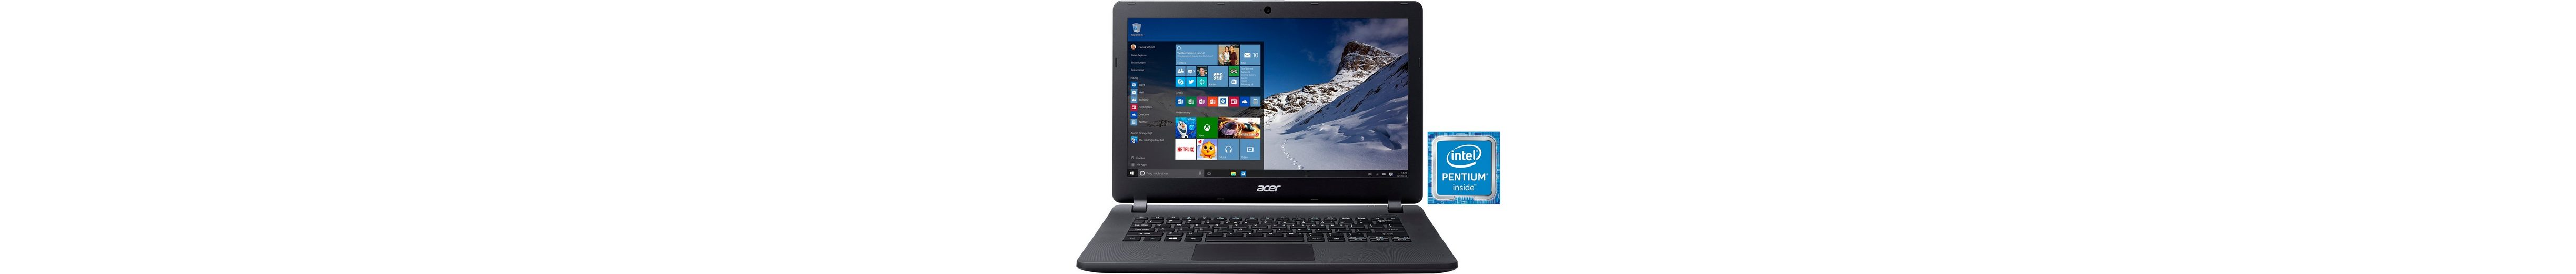 Acer Aspire ES1-331-P345 Notebook, Intel® Pentium™, 33,8 cm (13,3 Zoll), 500 GB Speicher